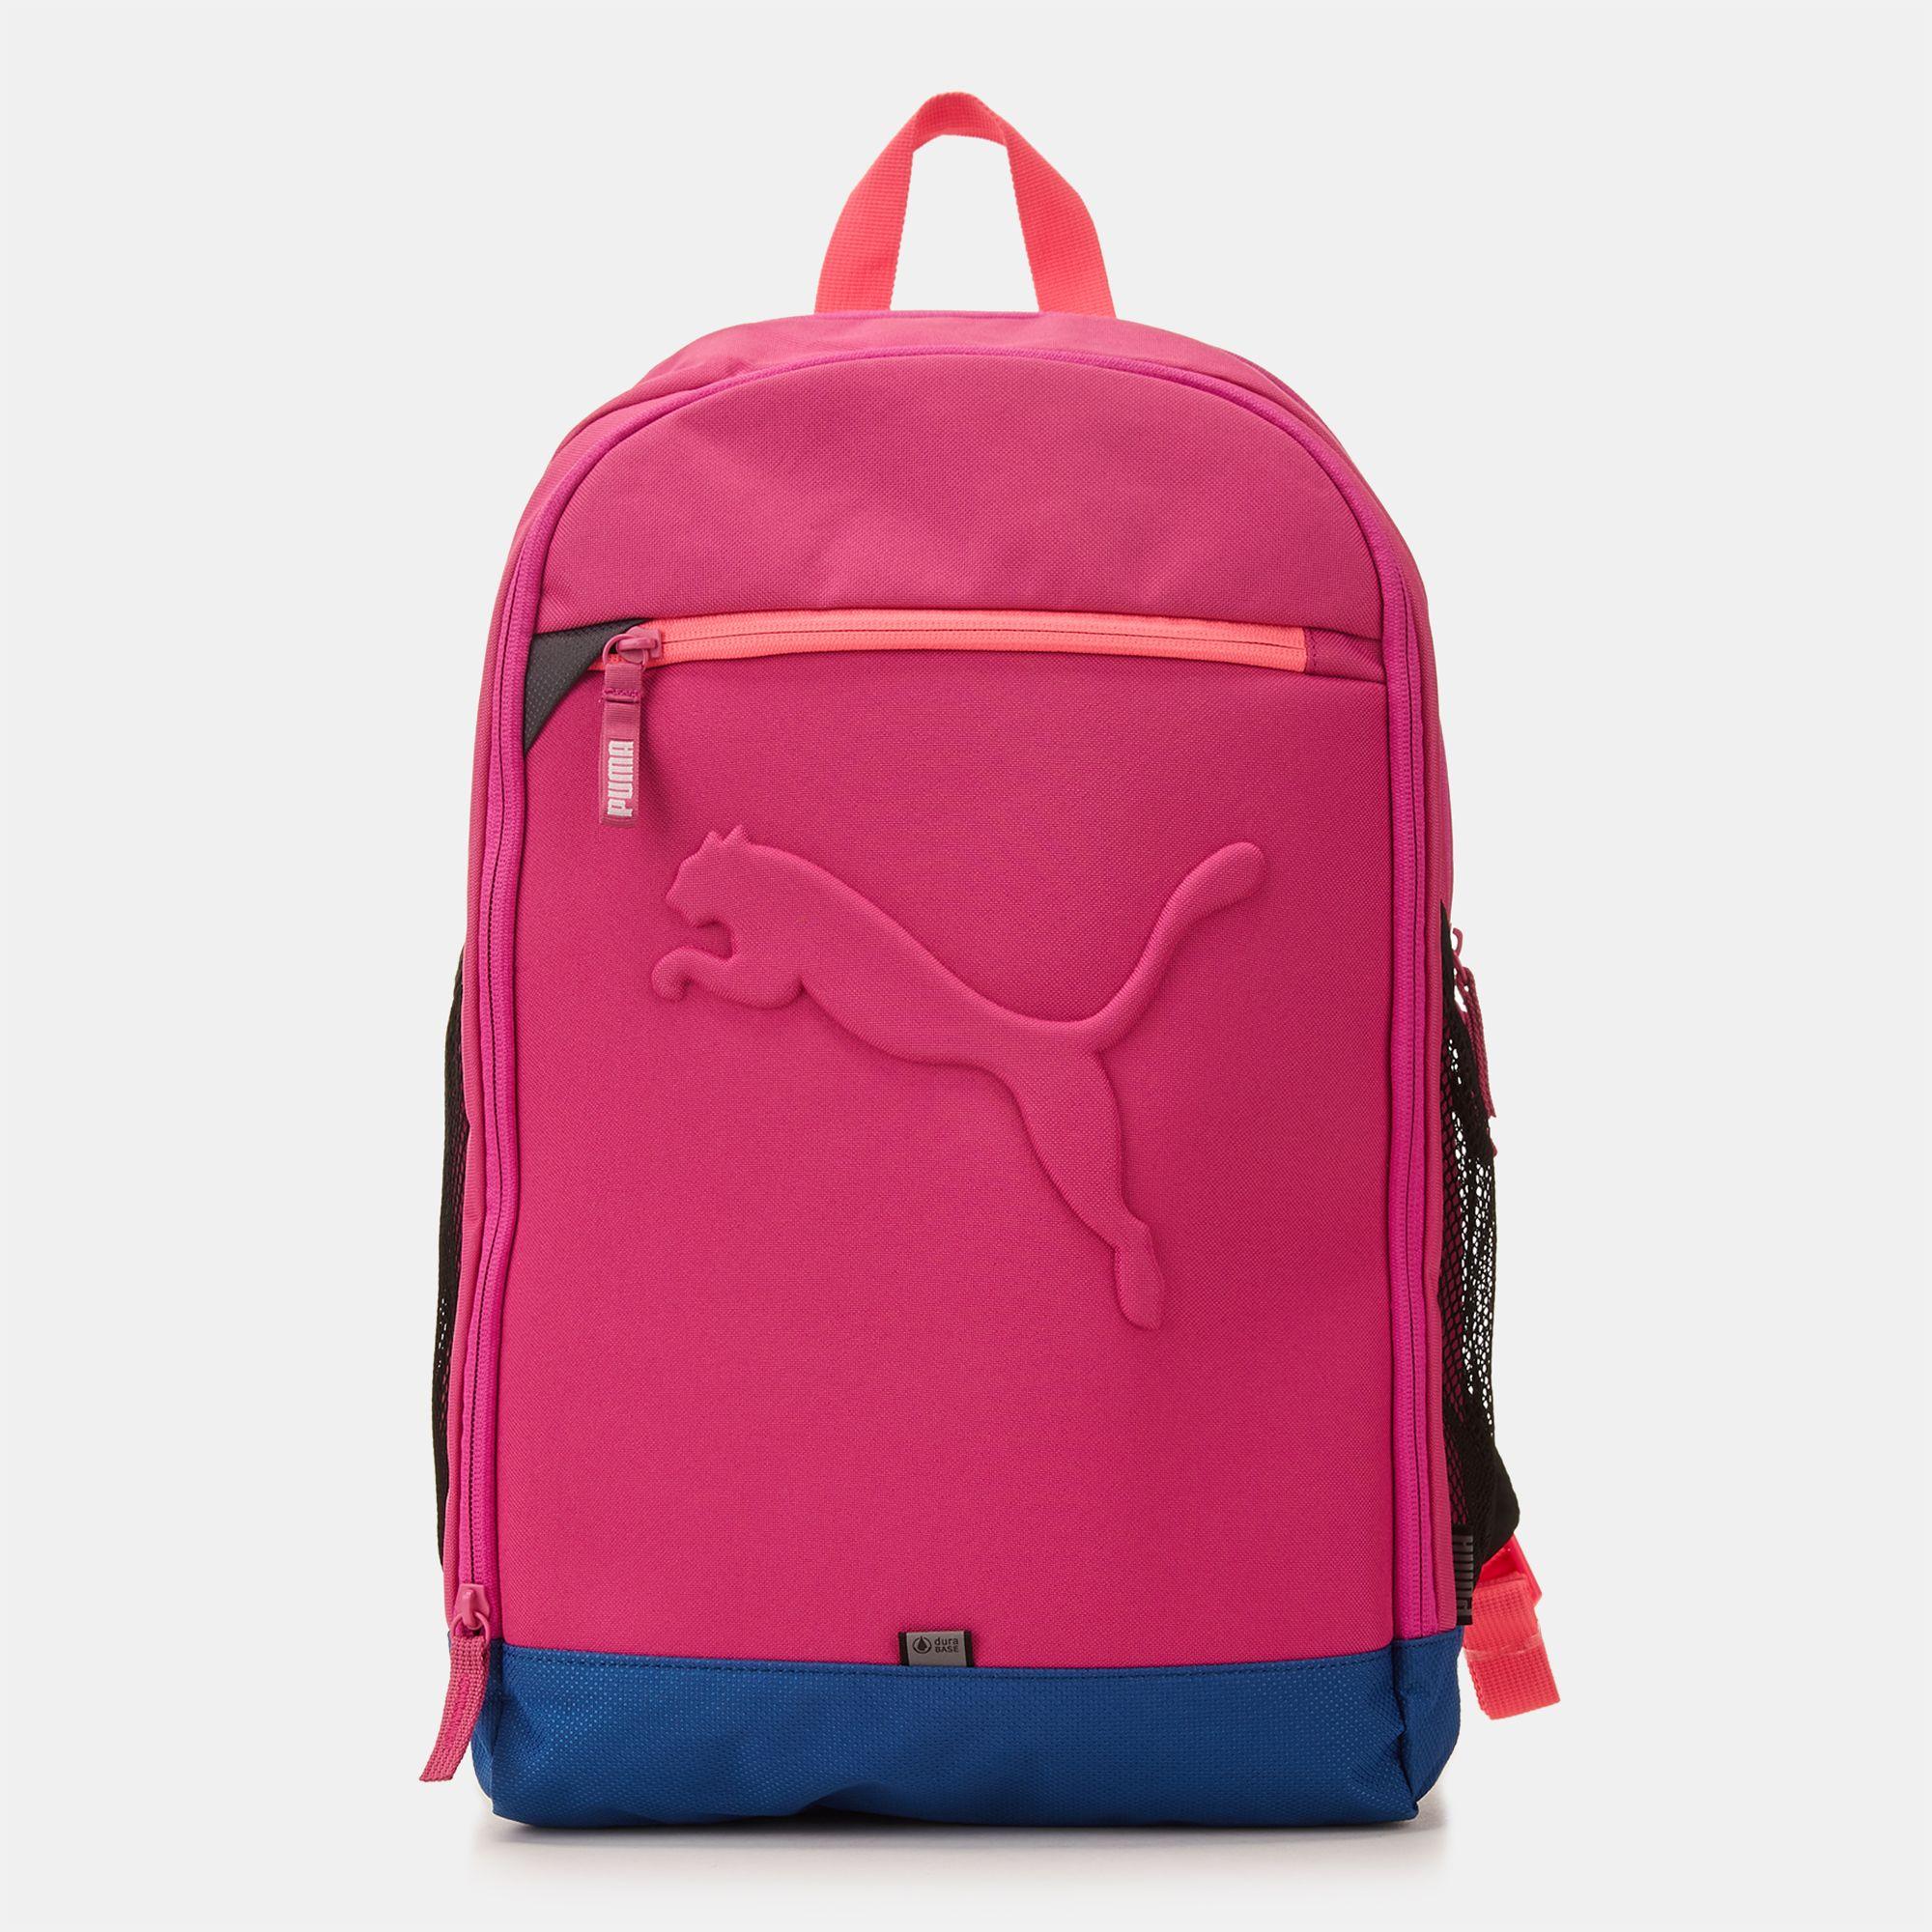 bde37c910c2f9 PUMA Buzz Backpack - Purple